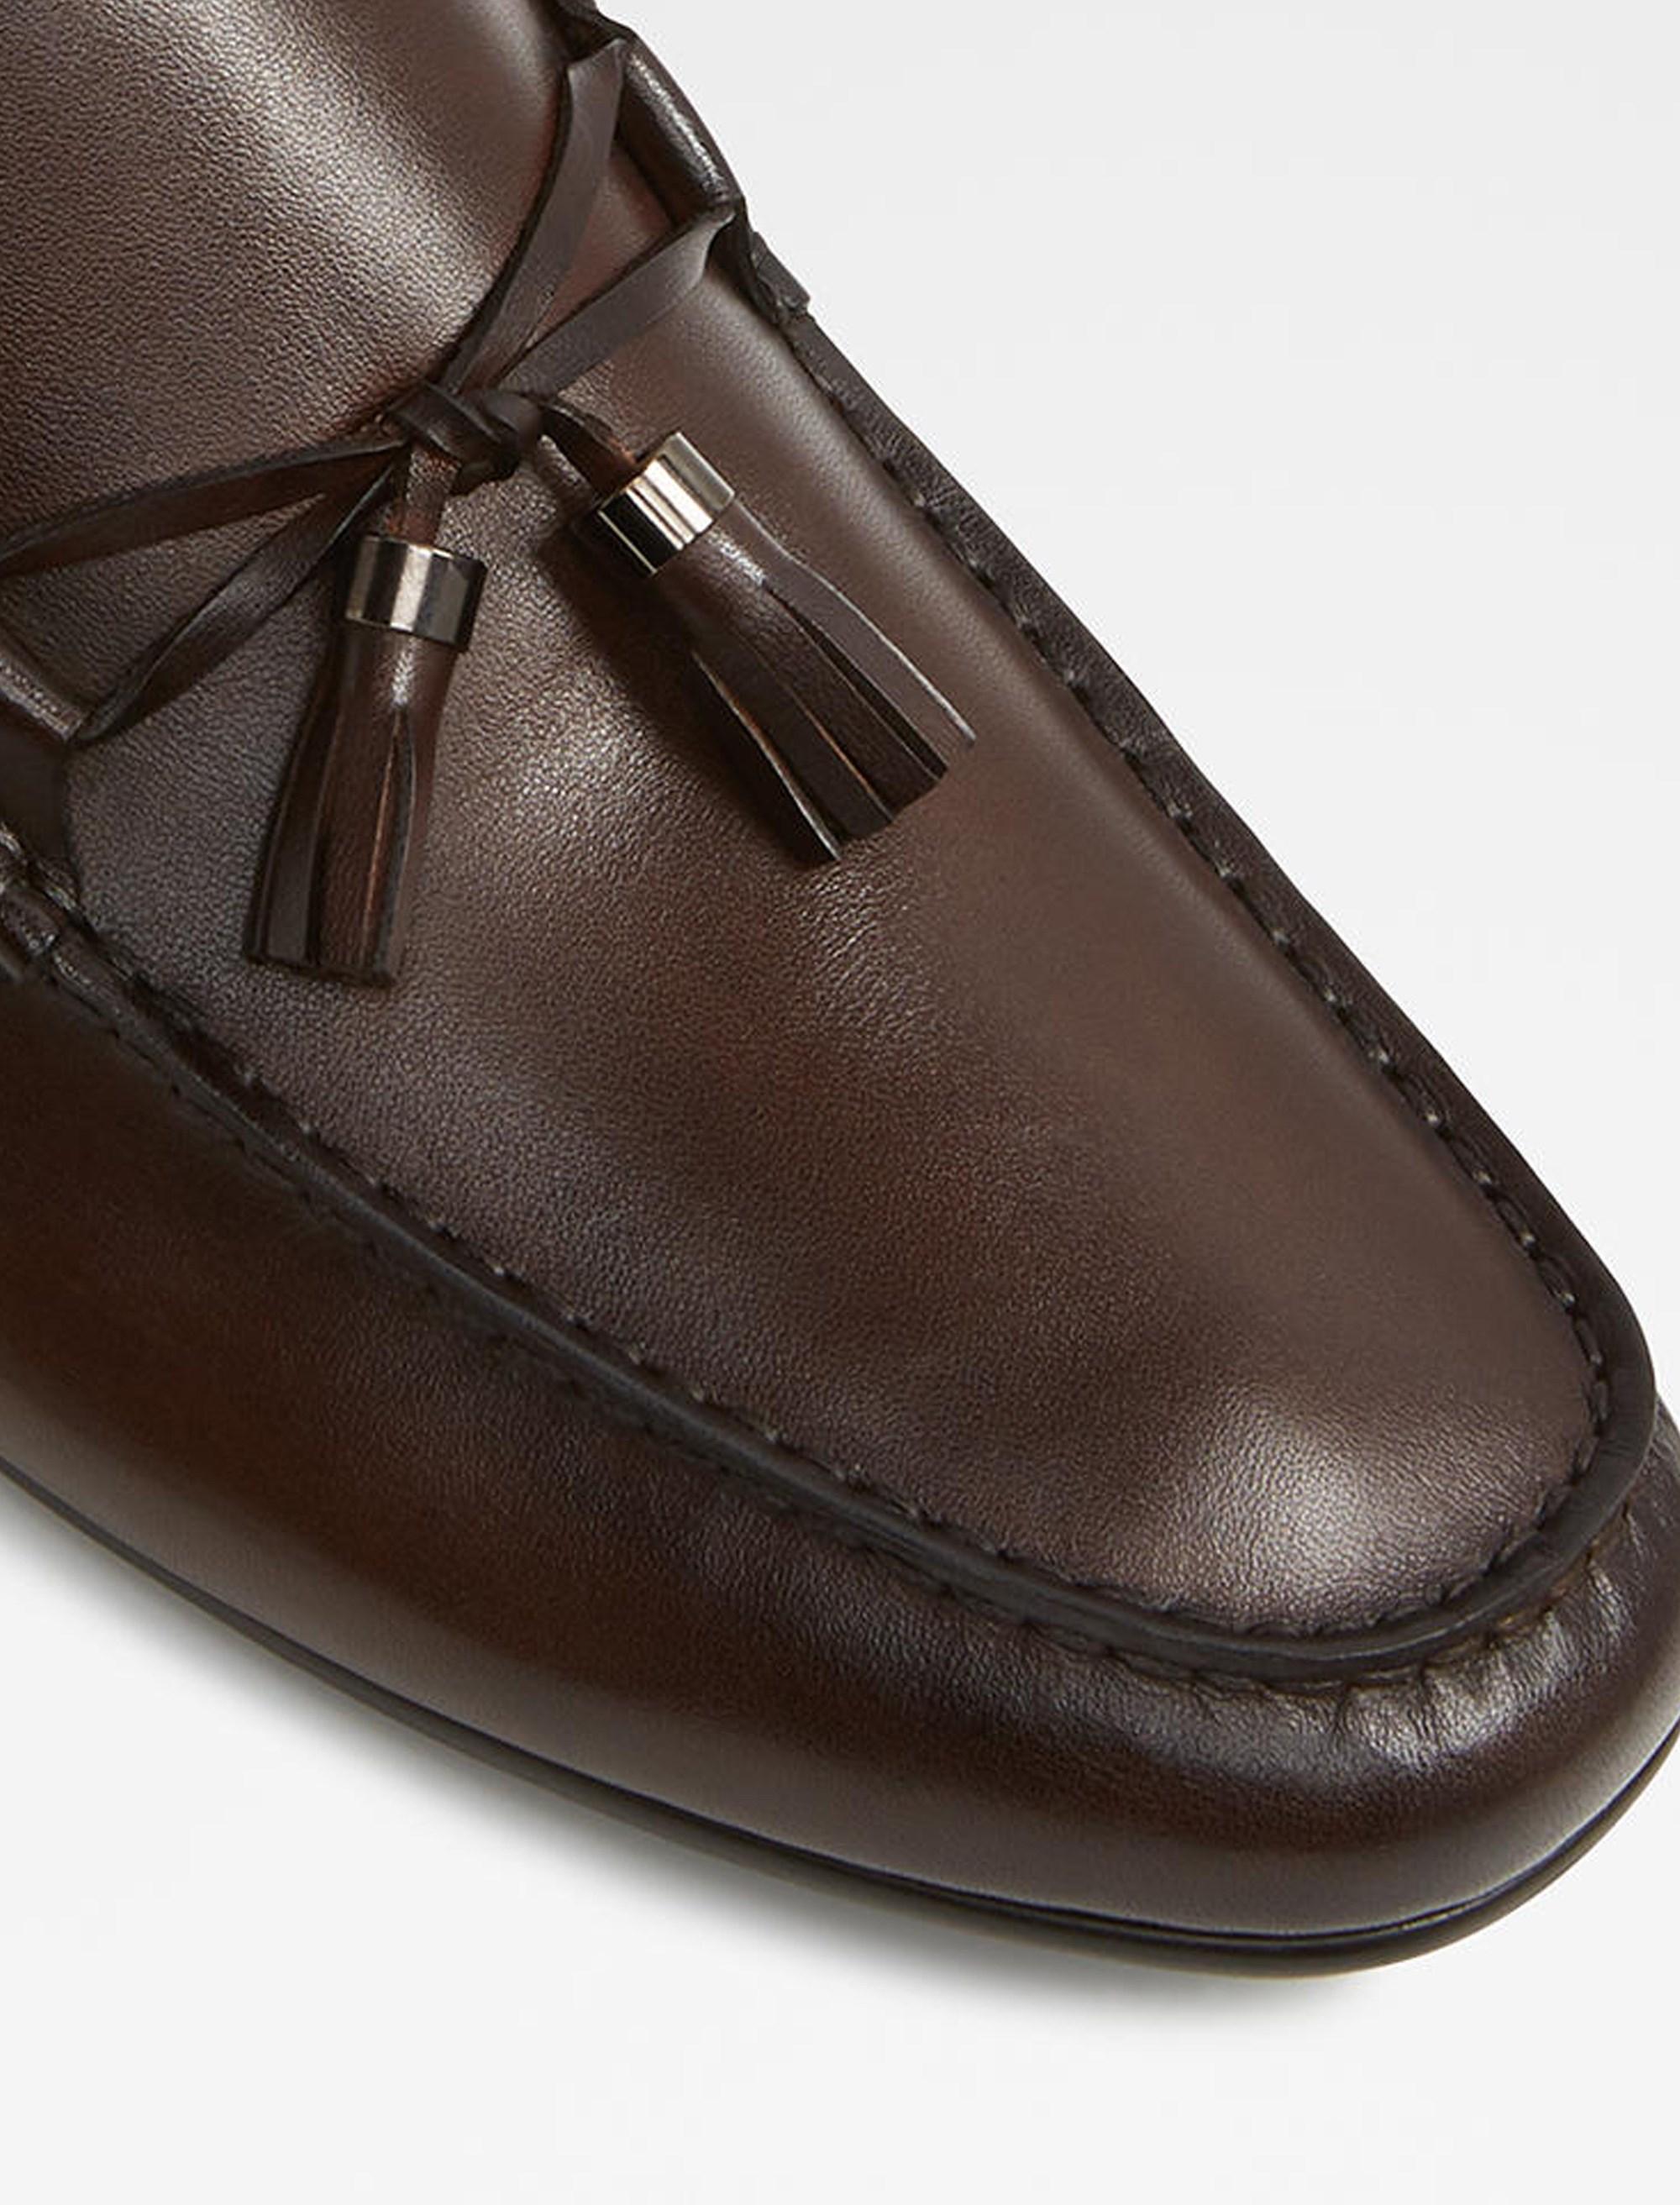 کفش راحتی چرم مردانه - قهوه اي - 4